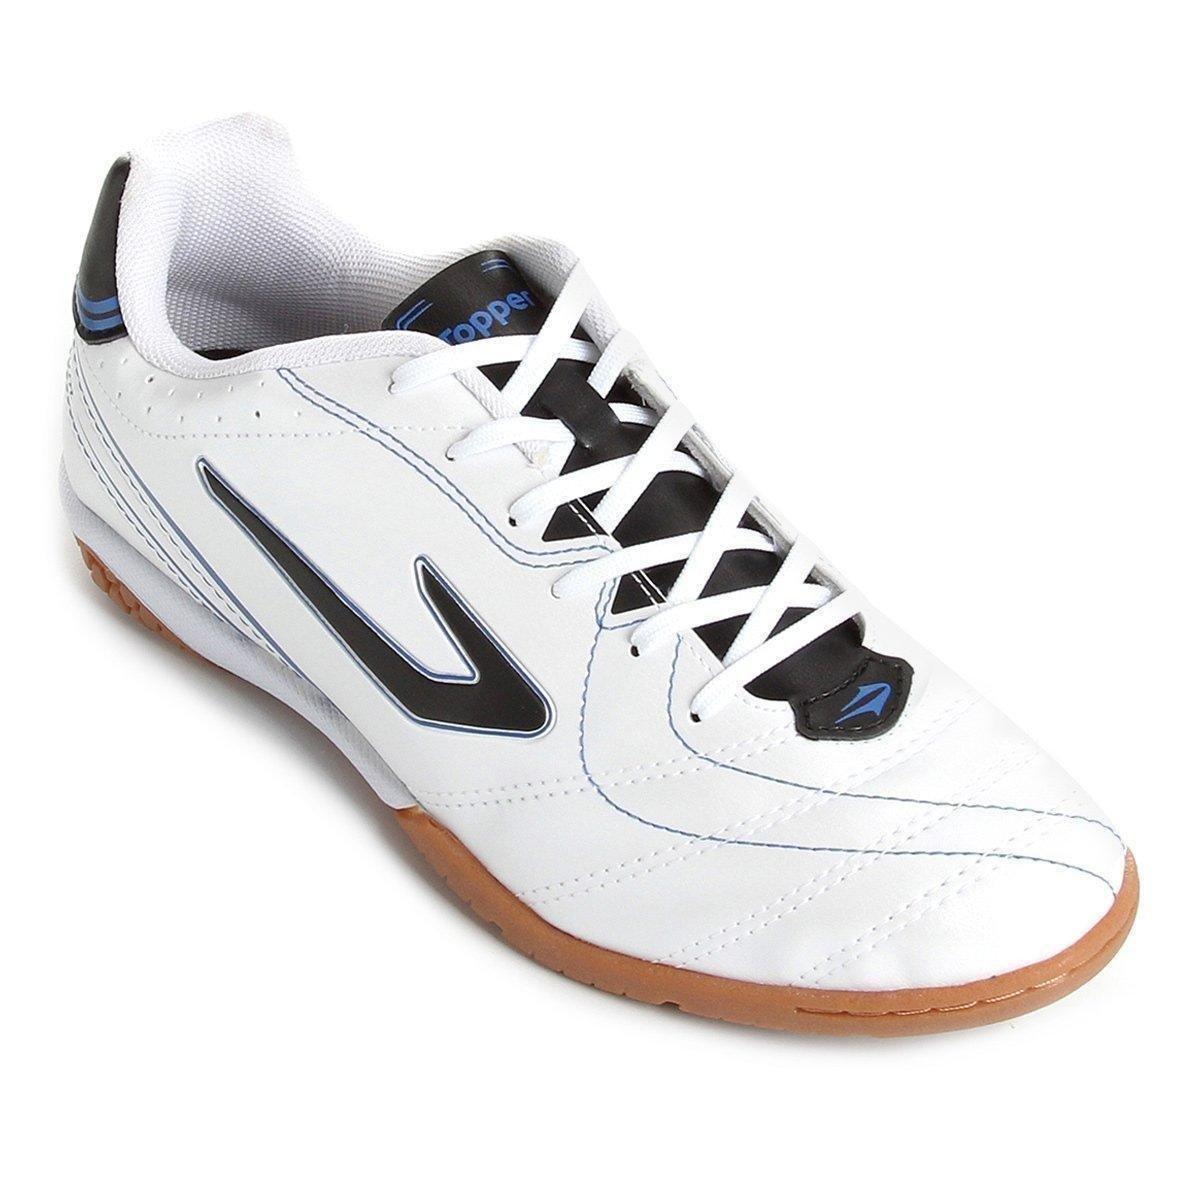 02733e8fe7ff3 Chuteira Futsal Topper Titanium 6 - Compre Agora